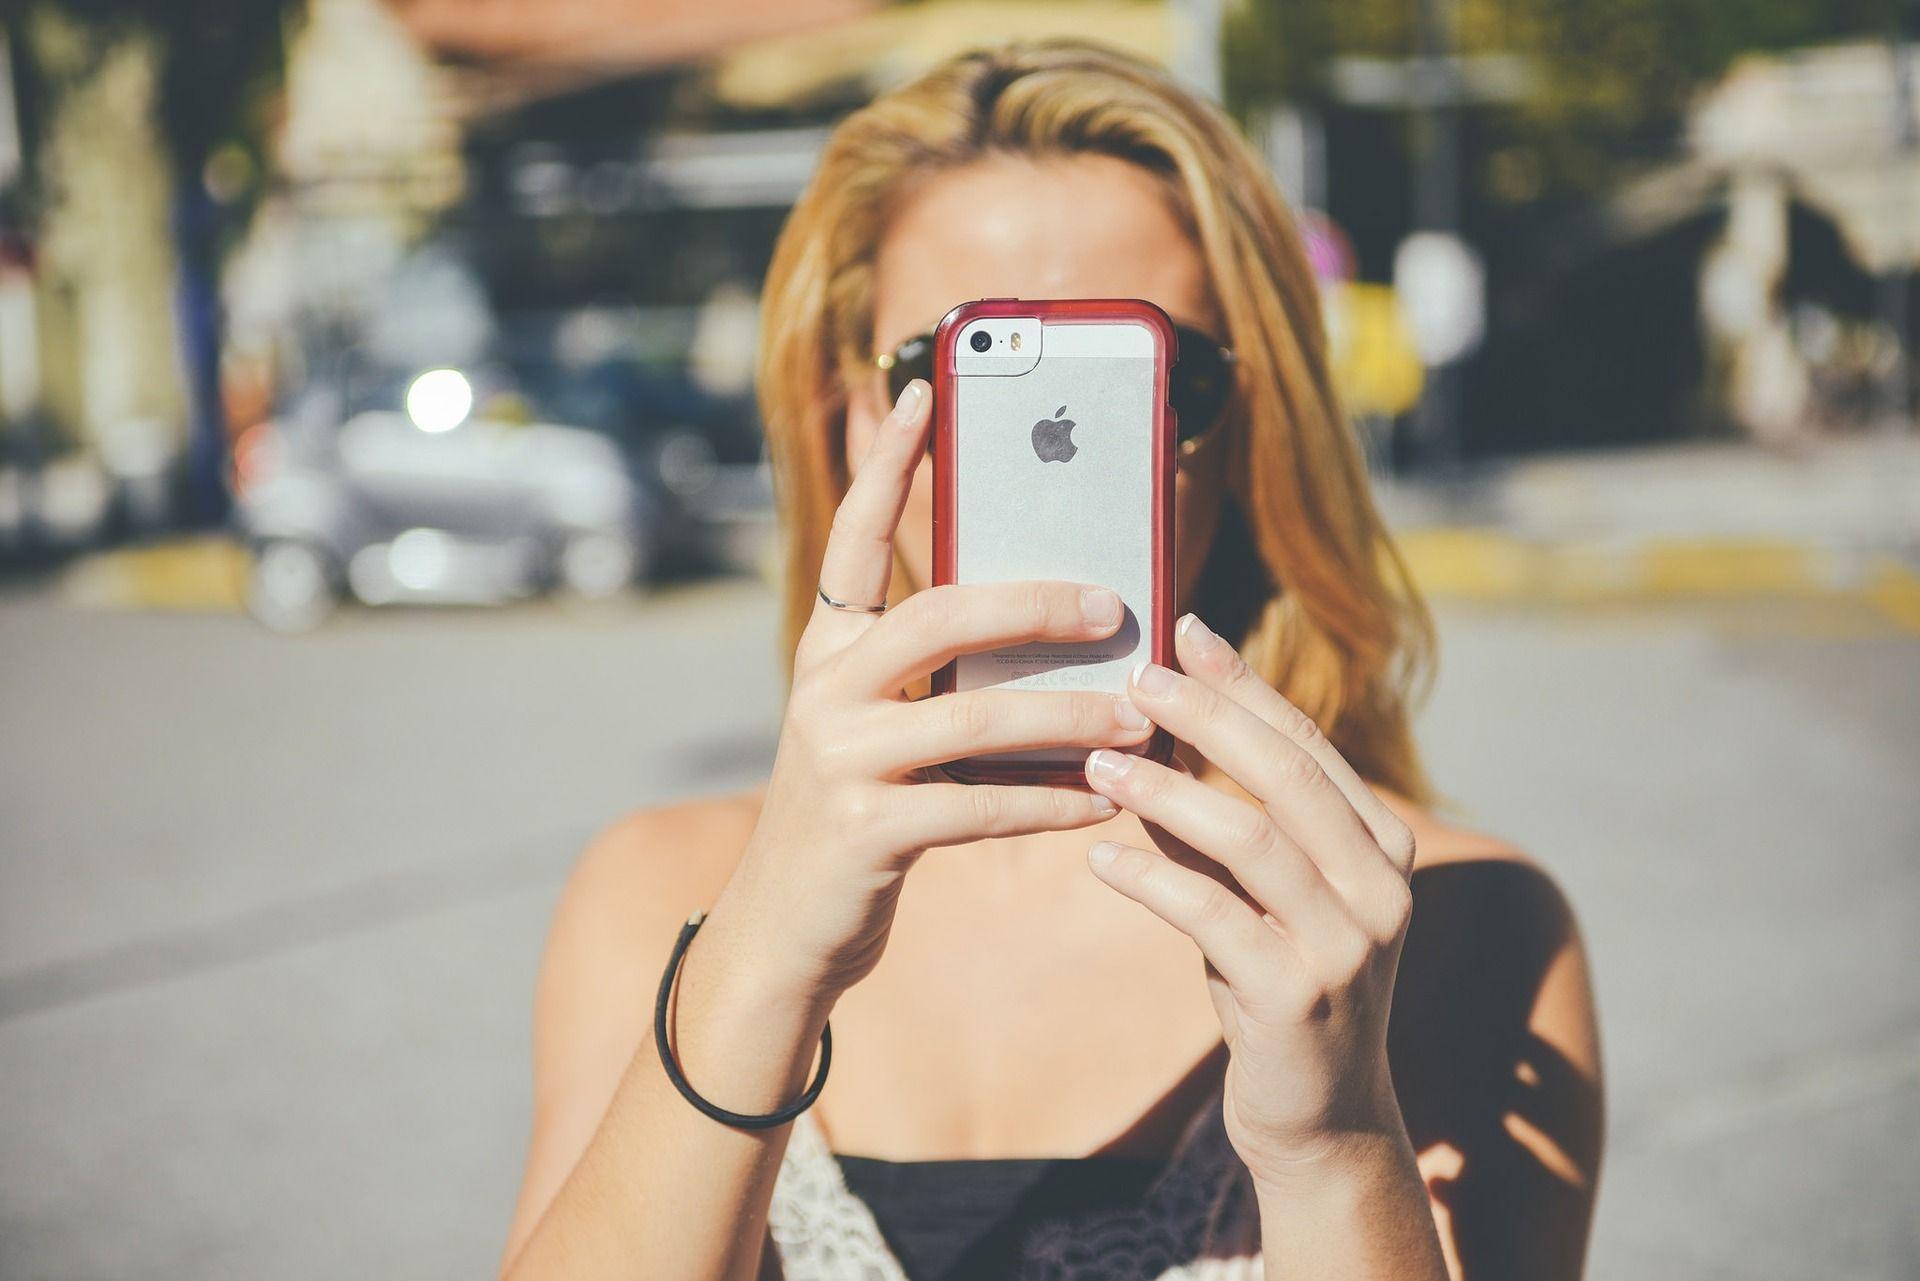 Chica descubre con su móvil Freedompop Premier Plus